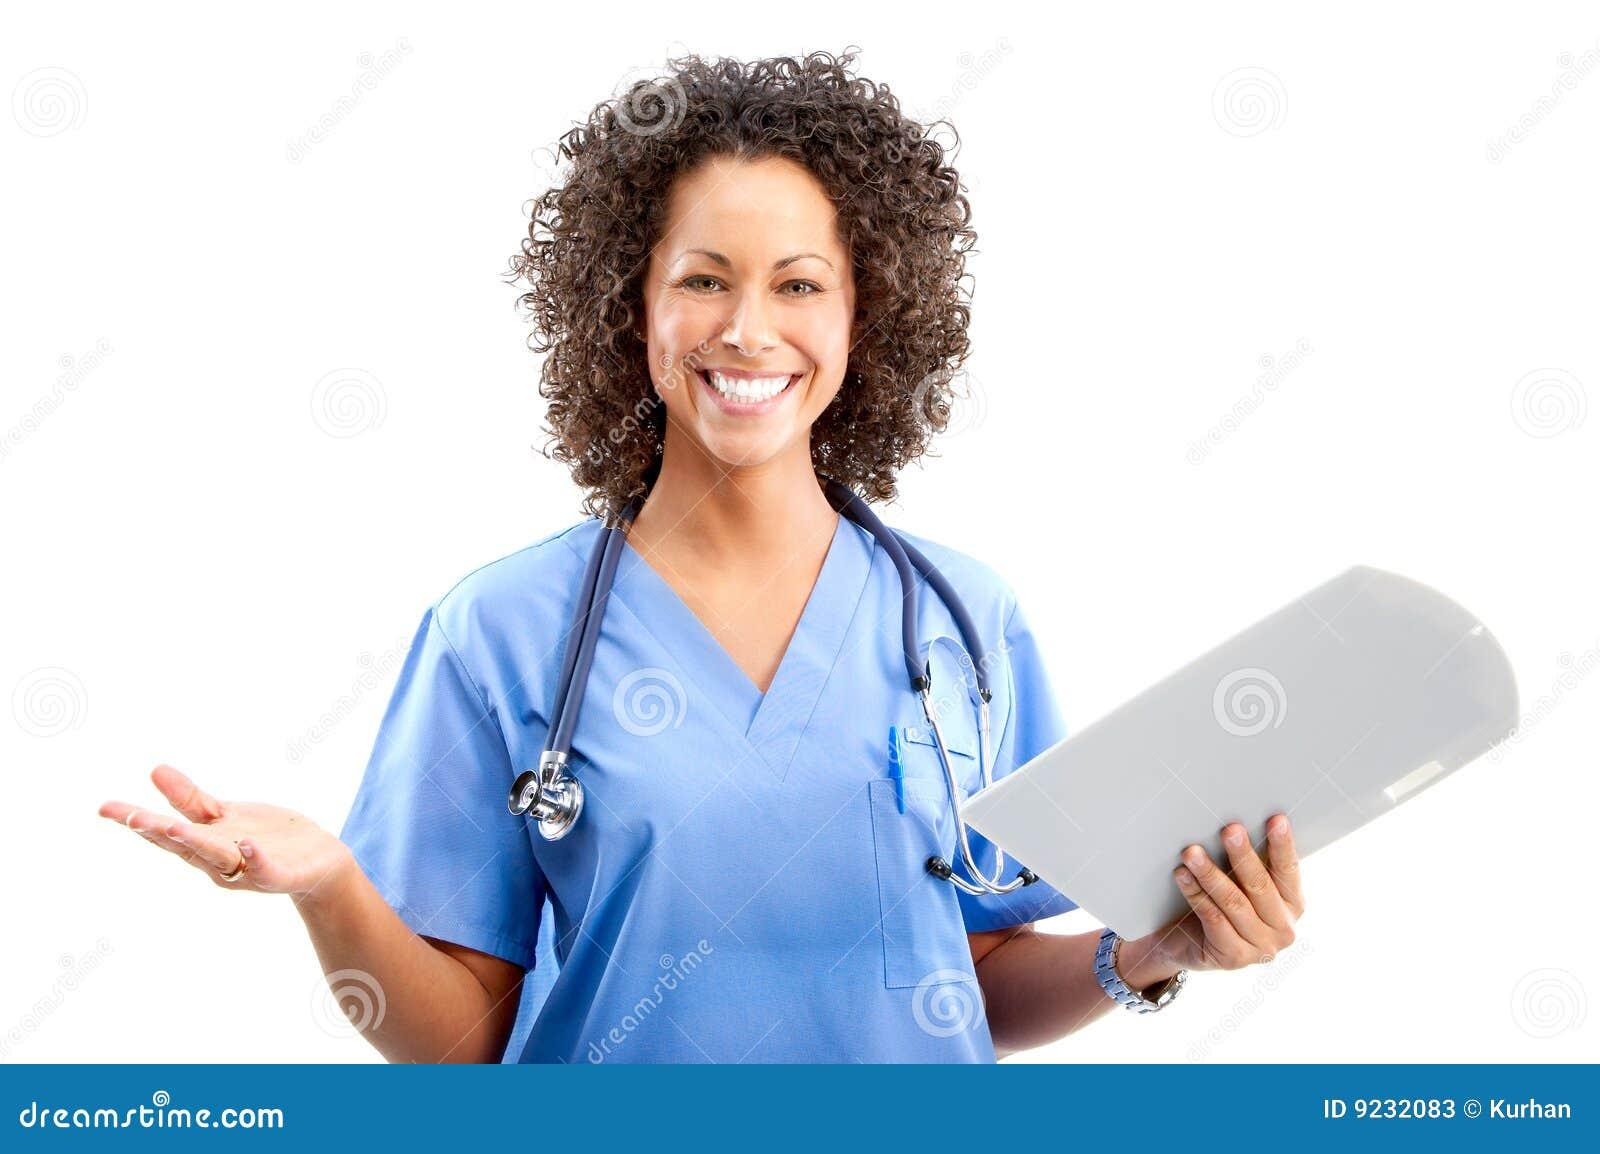 Smiling Nurse Stock Photo - Download Image Now - iStock